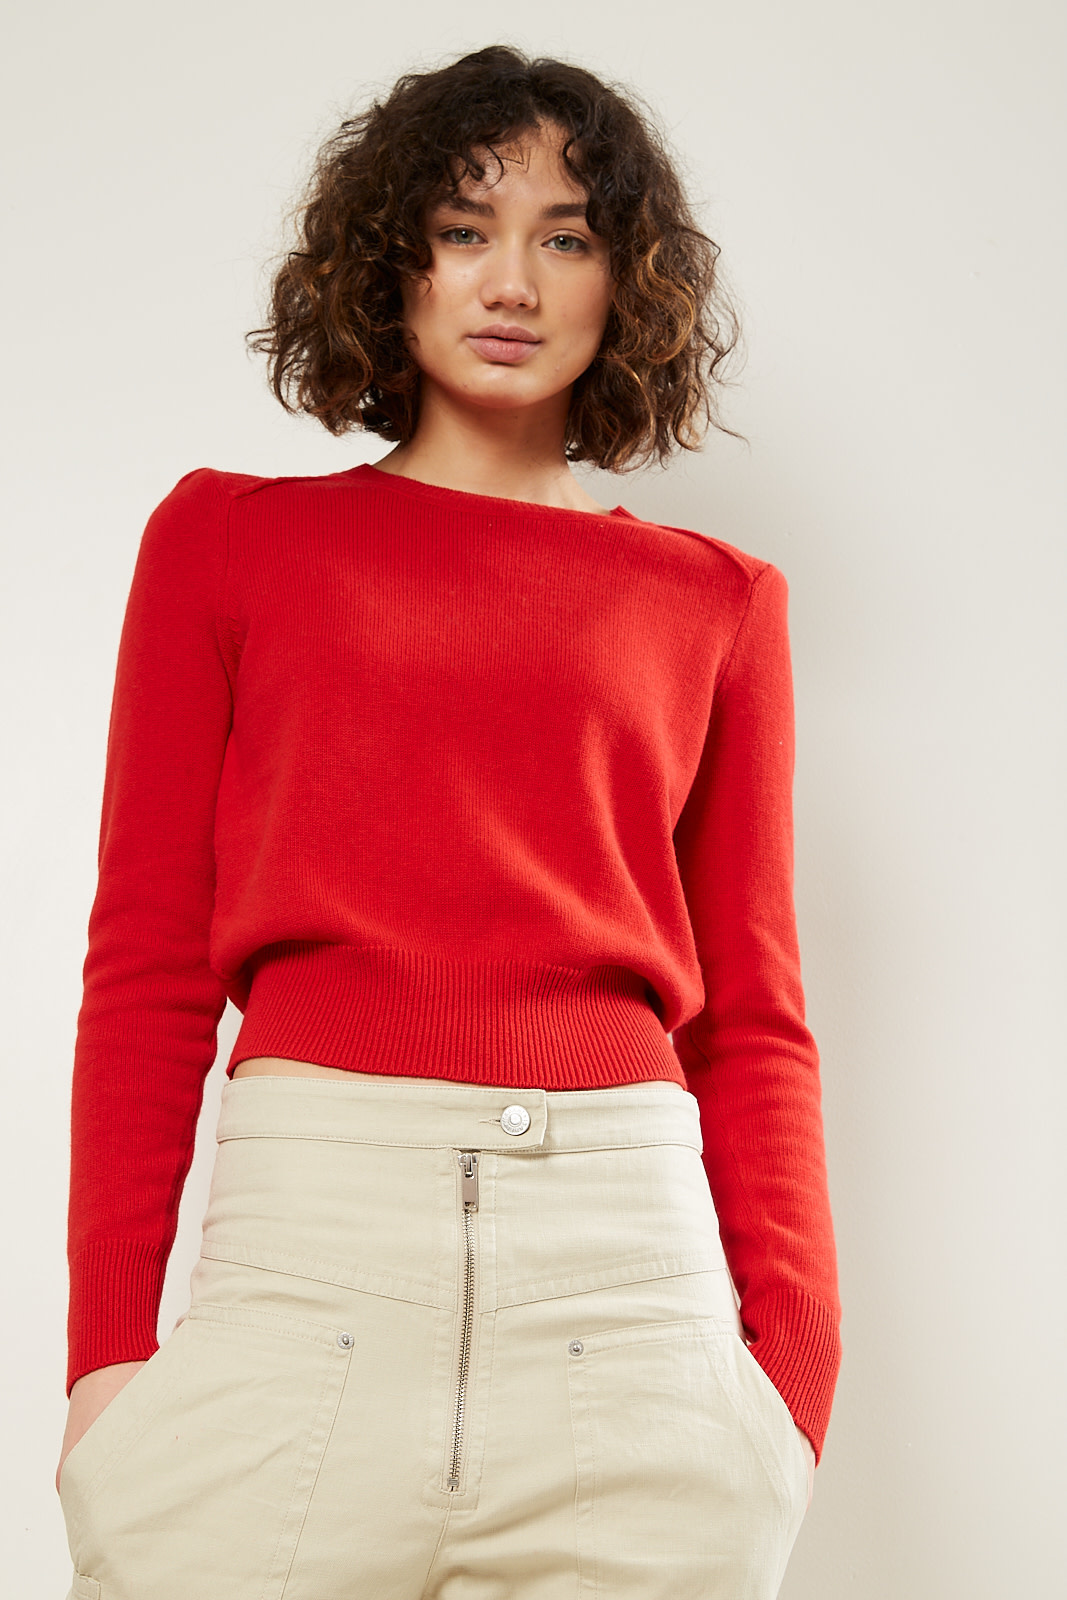 Etoile Isabel Marant kleely regular knit sweater